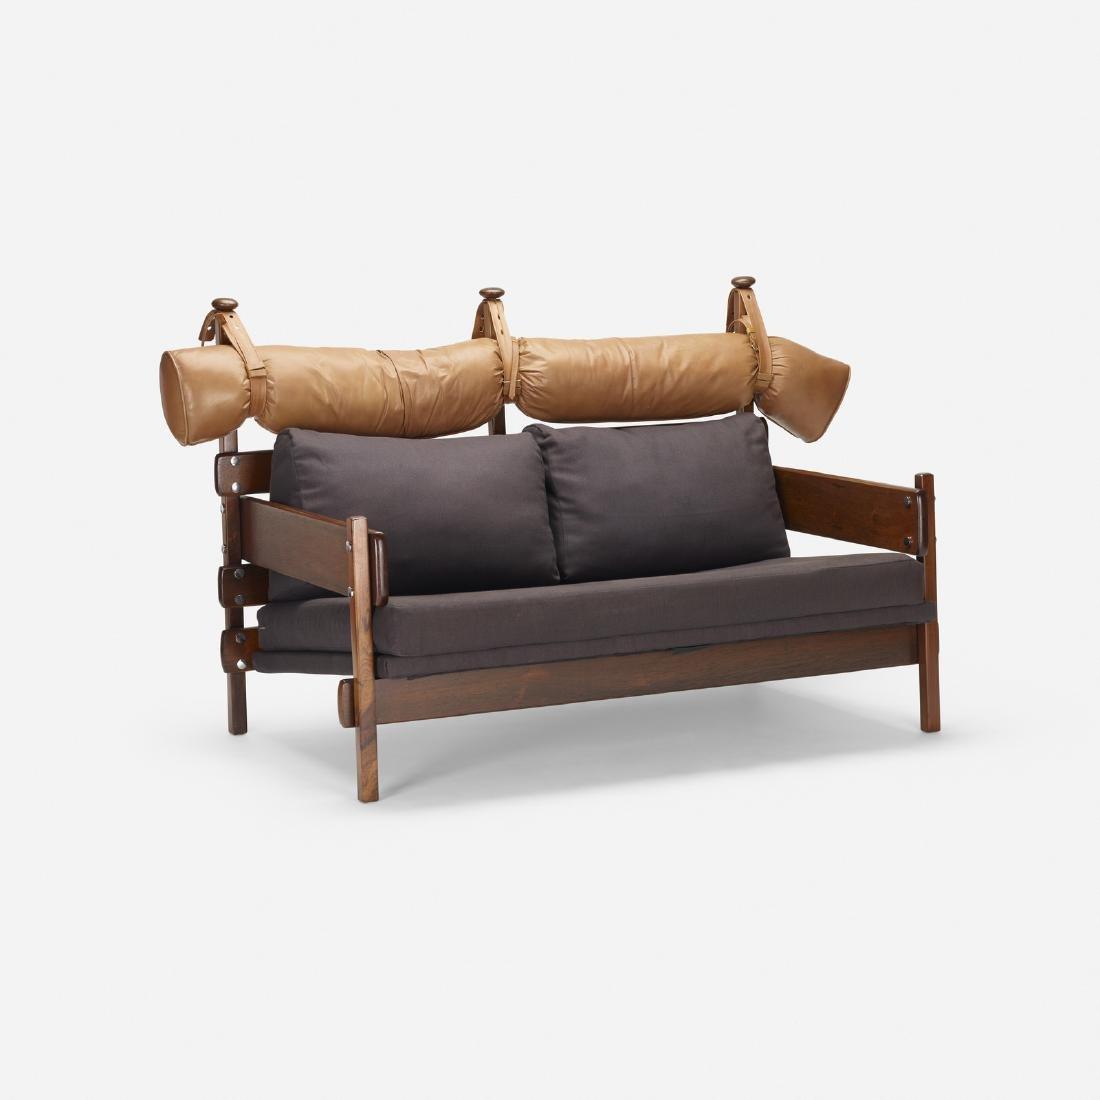 Sergio Rodrigues, Tonico sofa